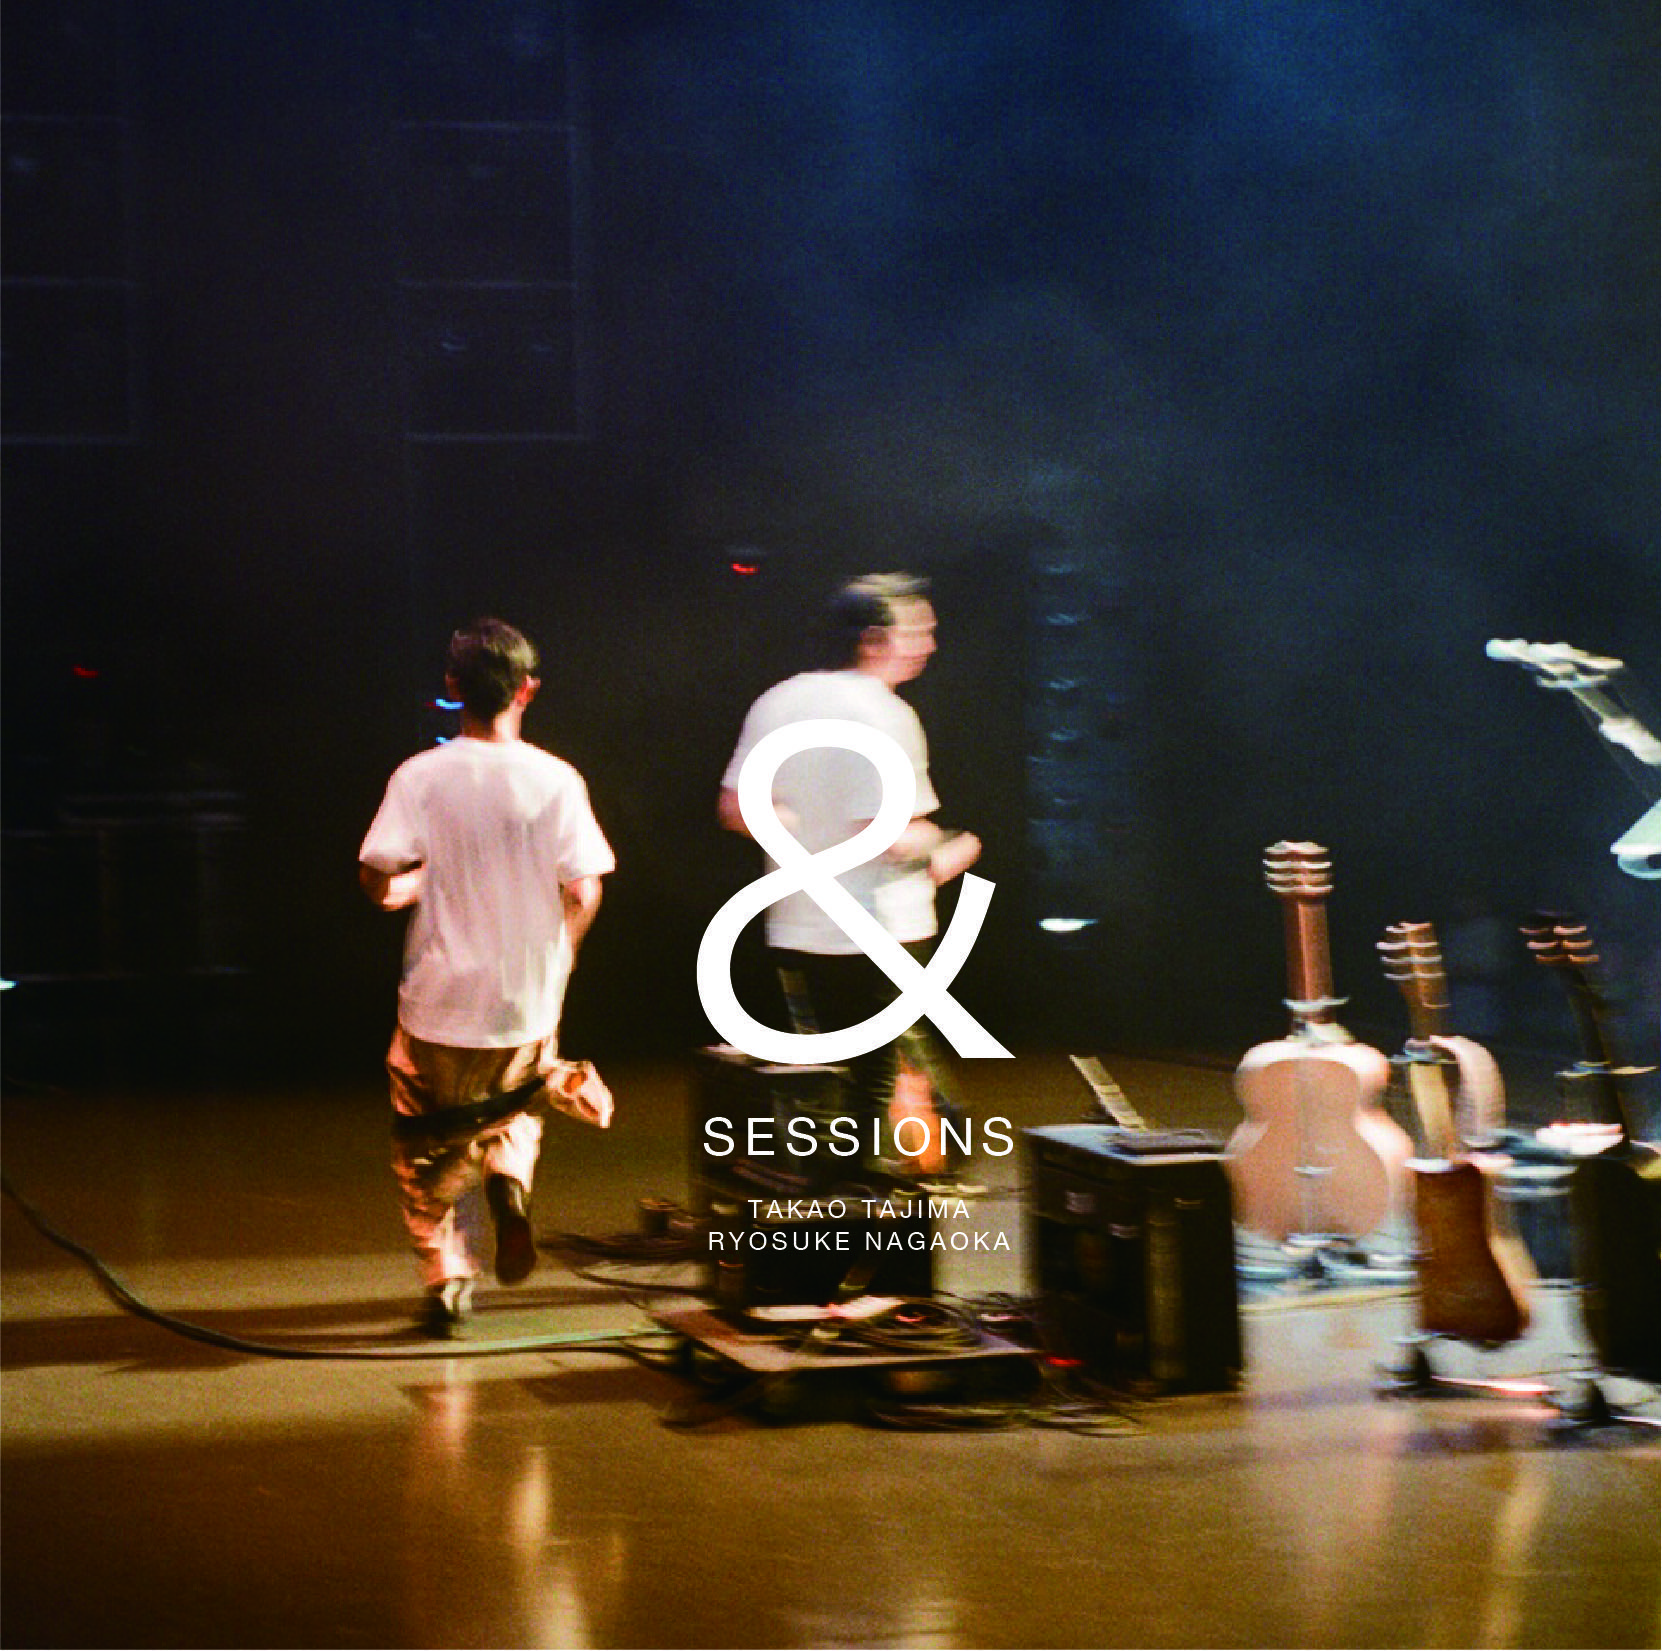 田島貴男&長岡亮介 original live recording album 『SESSIONS』